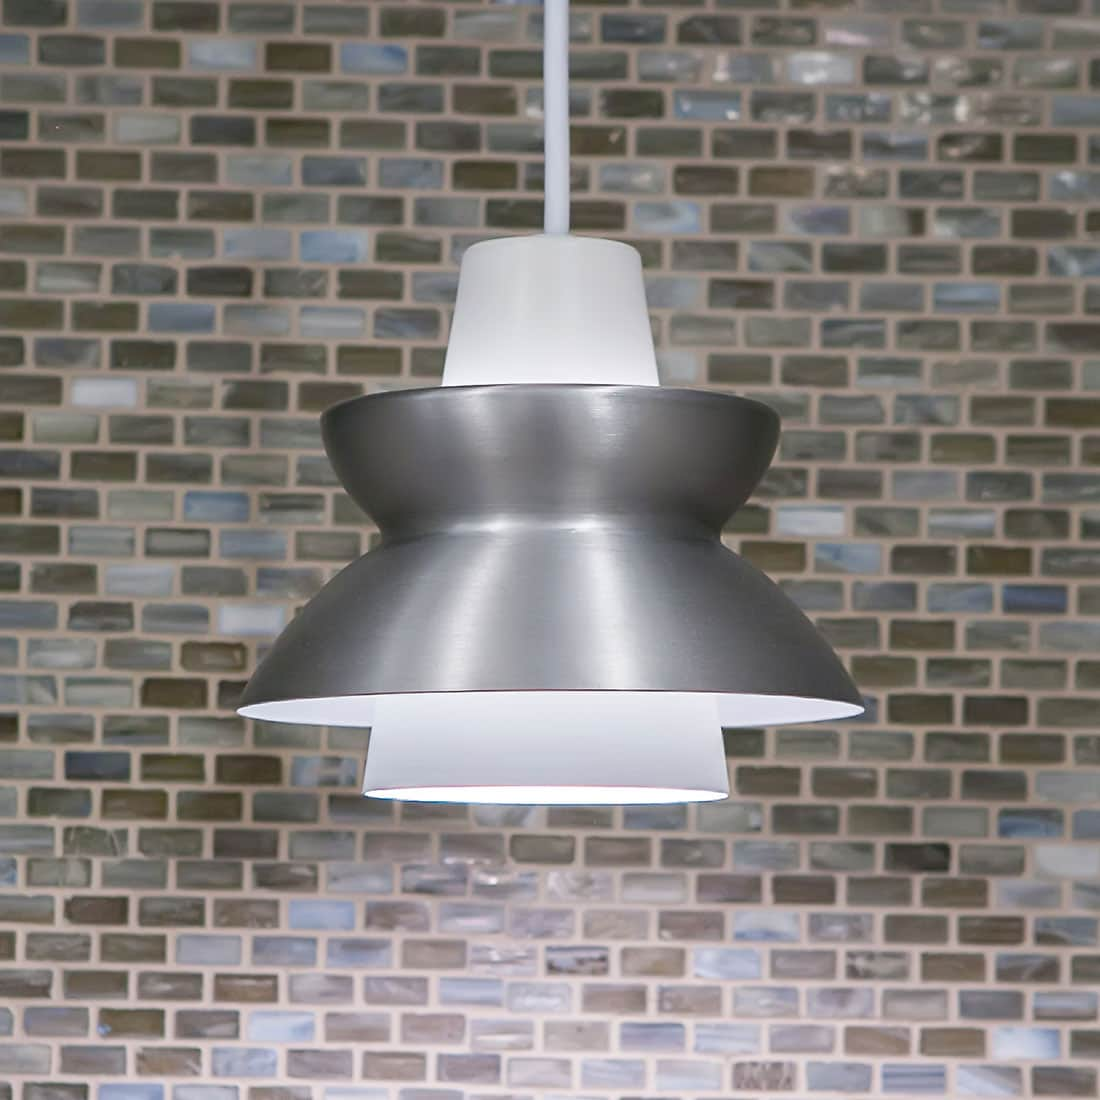 Modern nickel pendant light in renovated kitchen